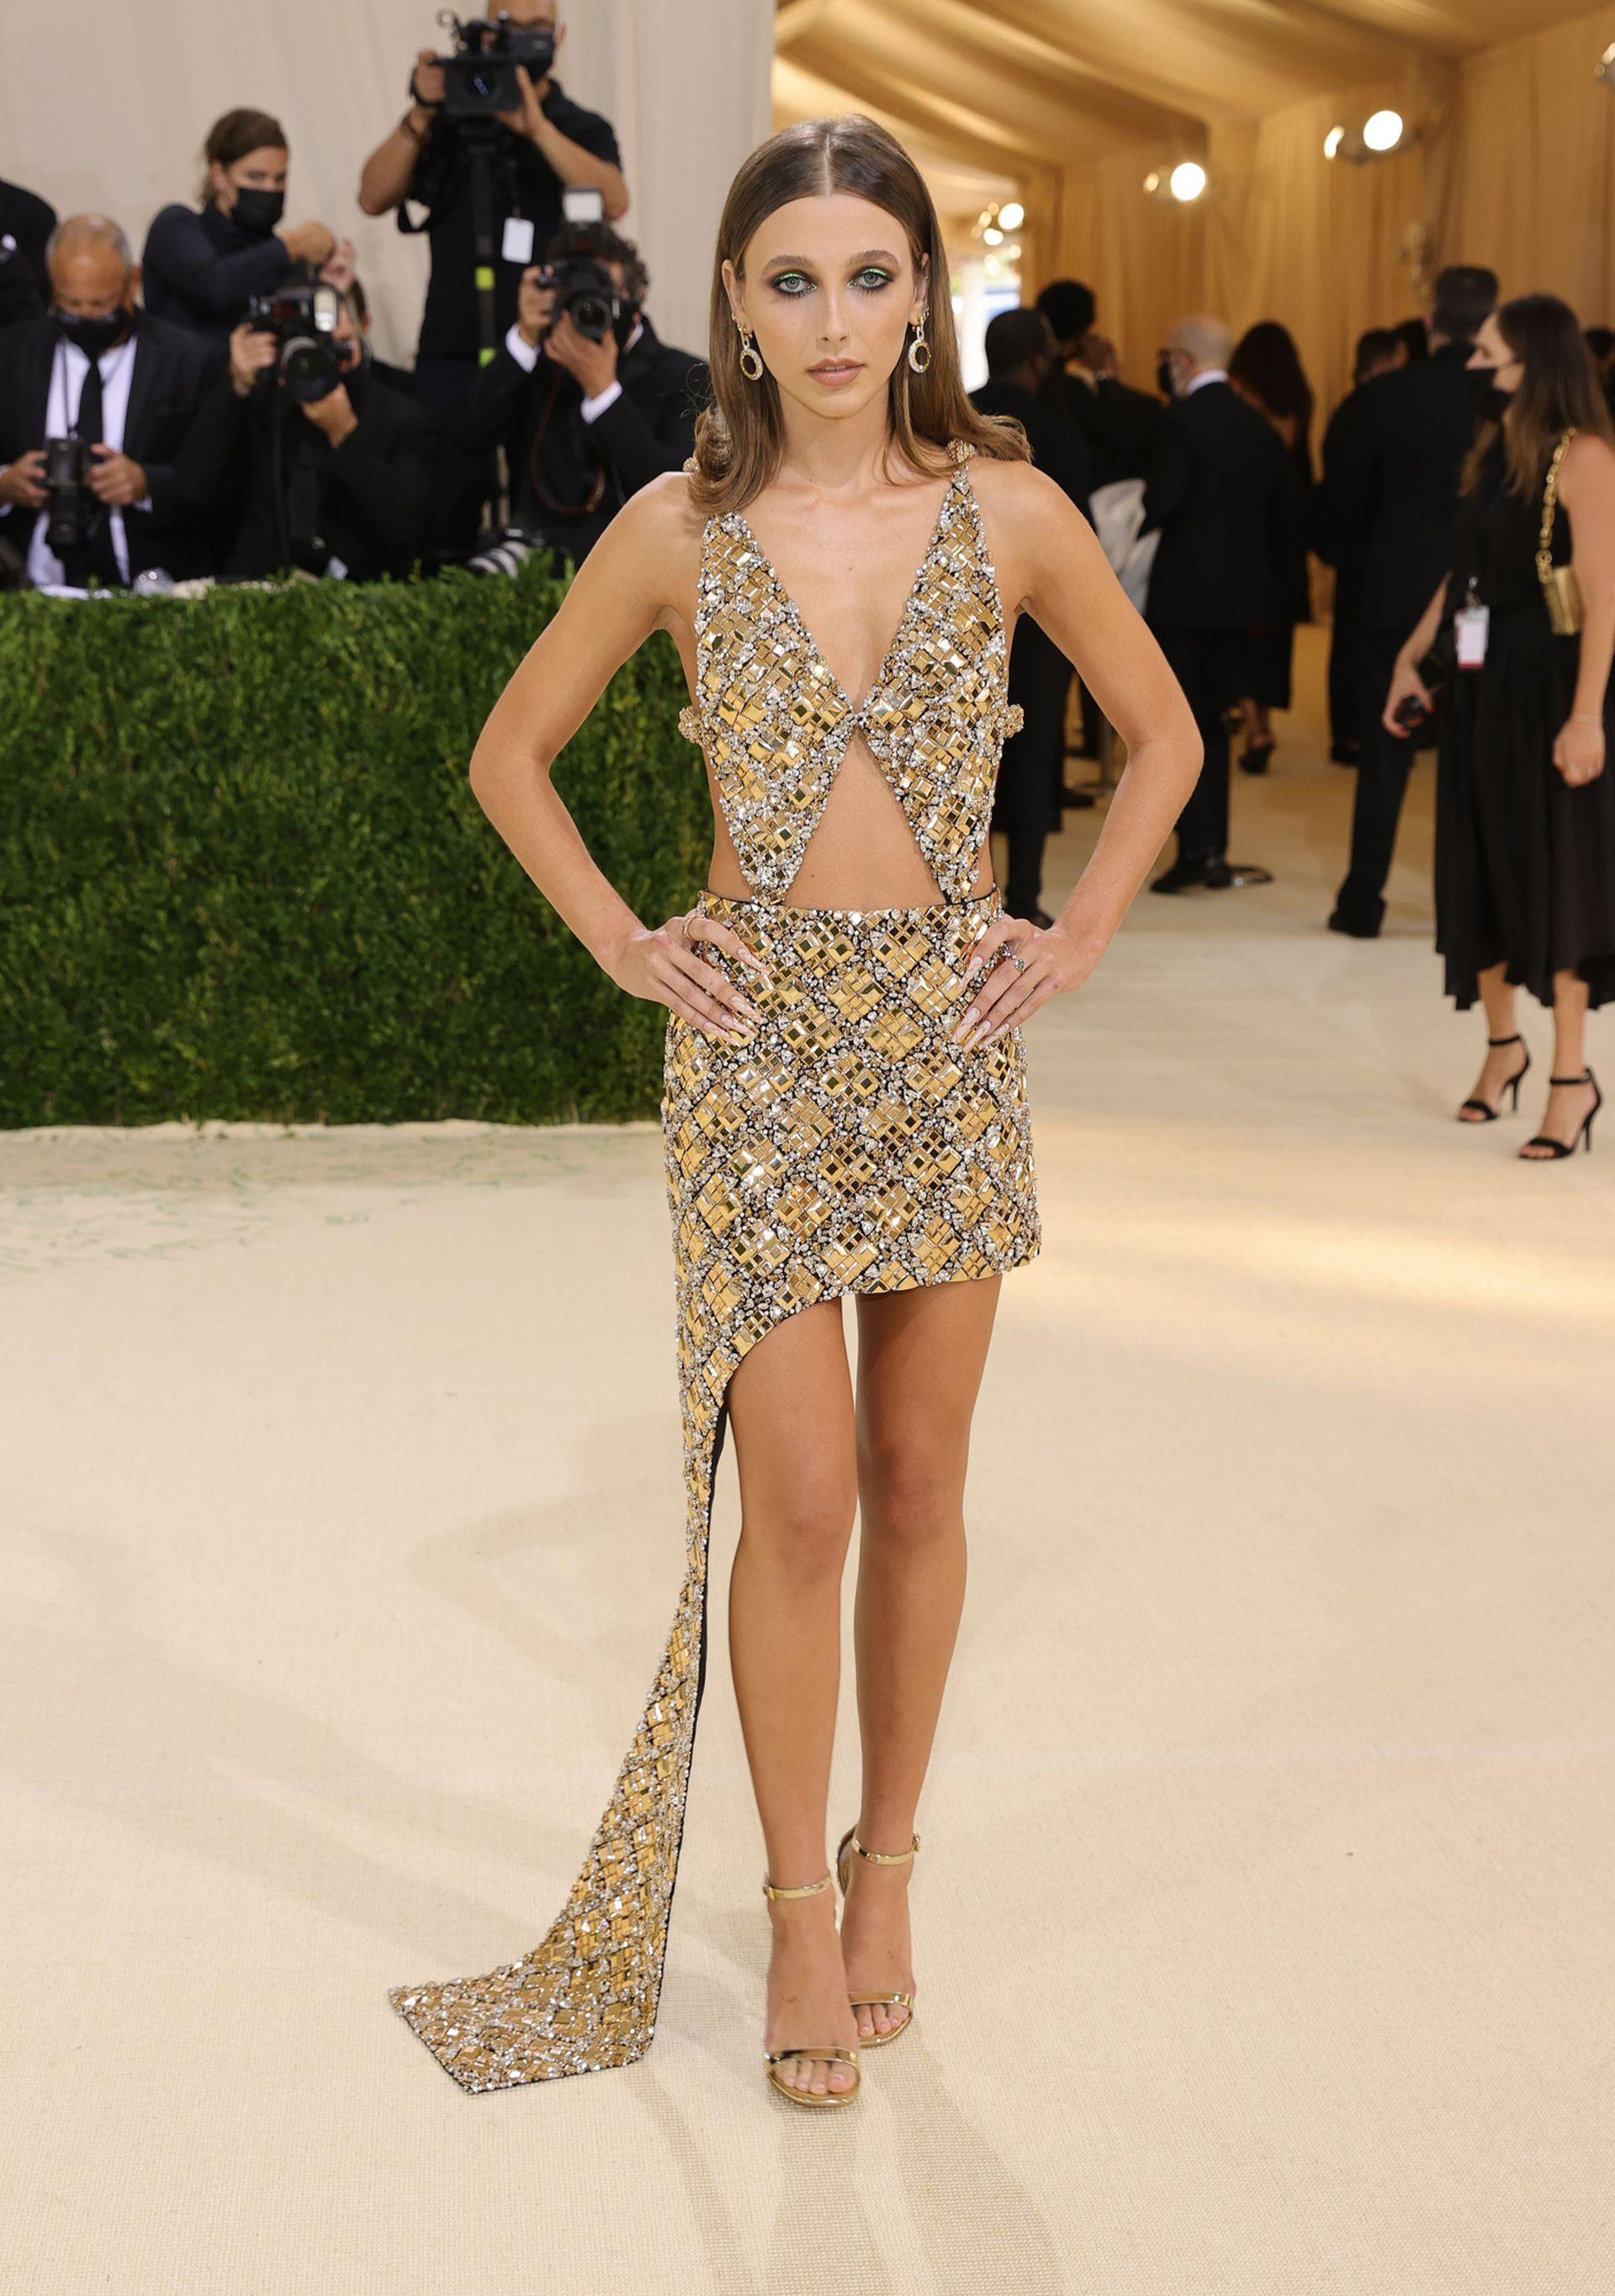 La influencer Emma Chamberlain, en la Gala Met 2021, vestida por Louis Vuitton